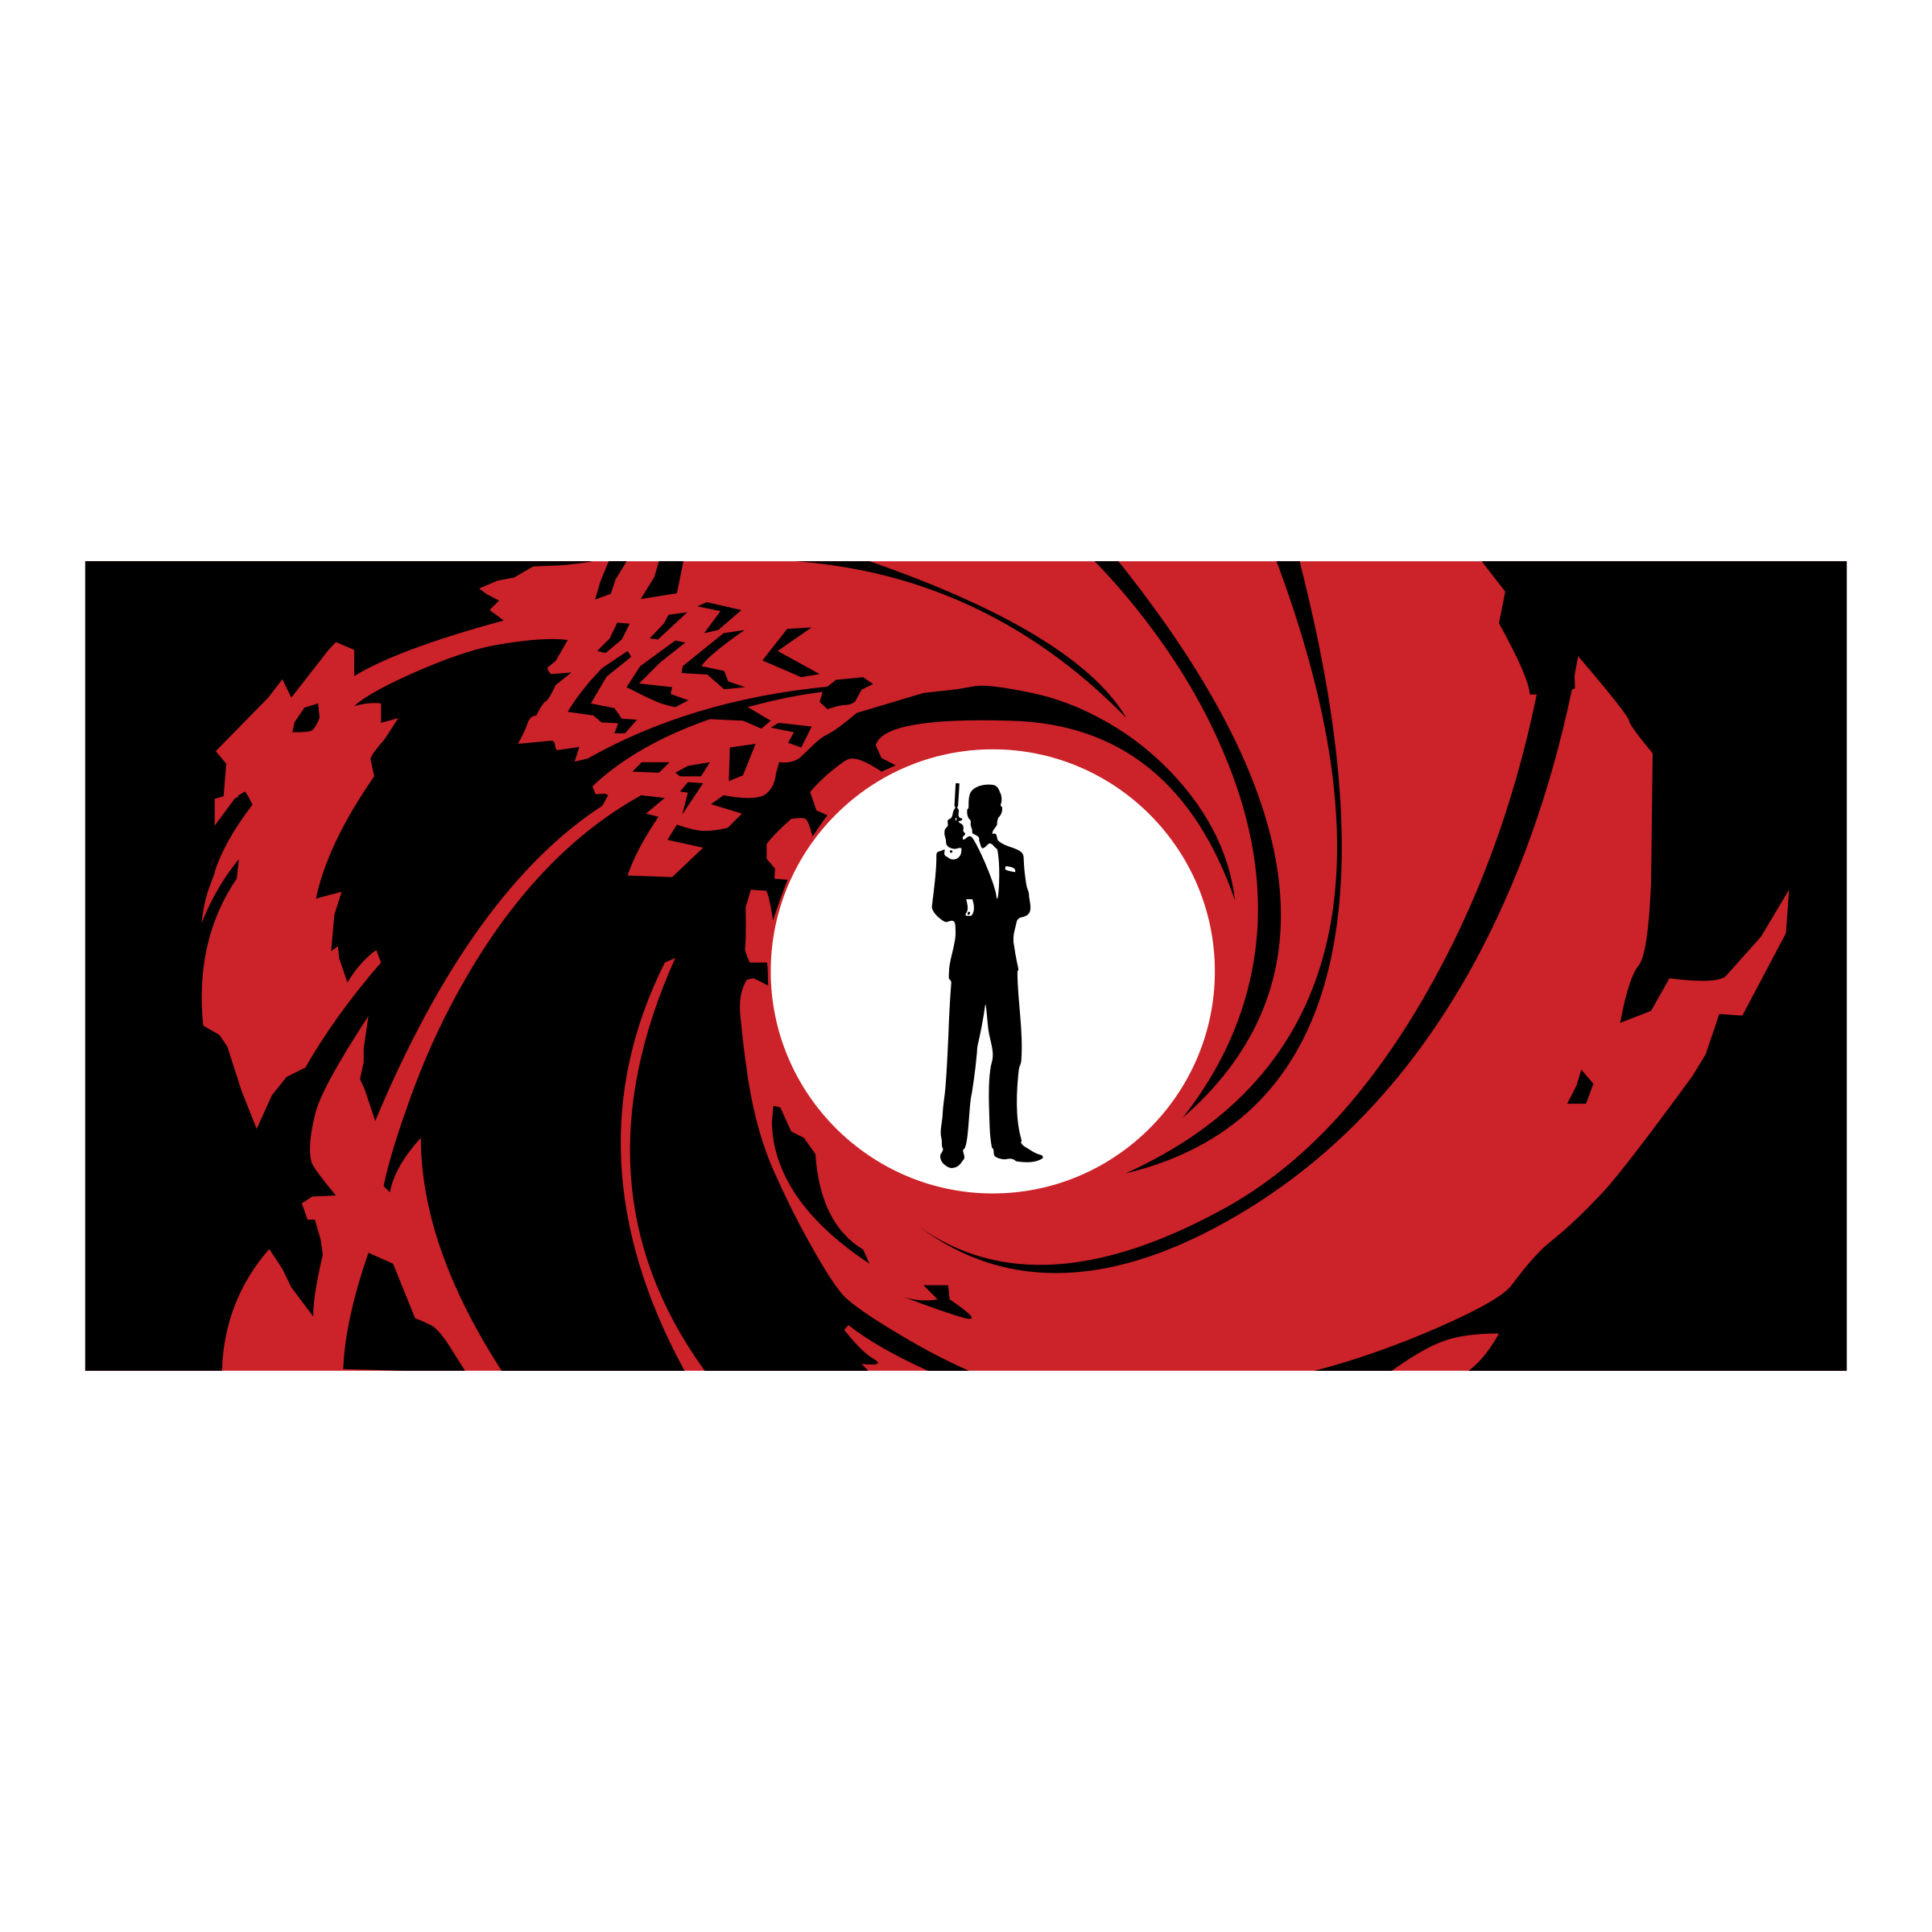 James Bond 007 Logo Png Transparent Svg Vector Freebie Supply James Bond Bond Bond Girls